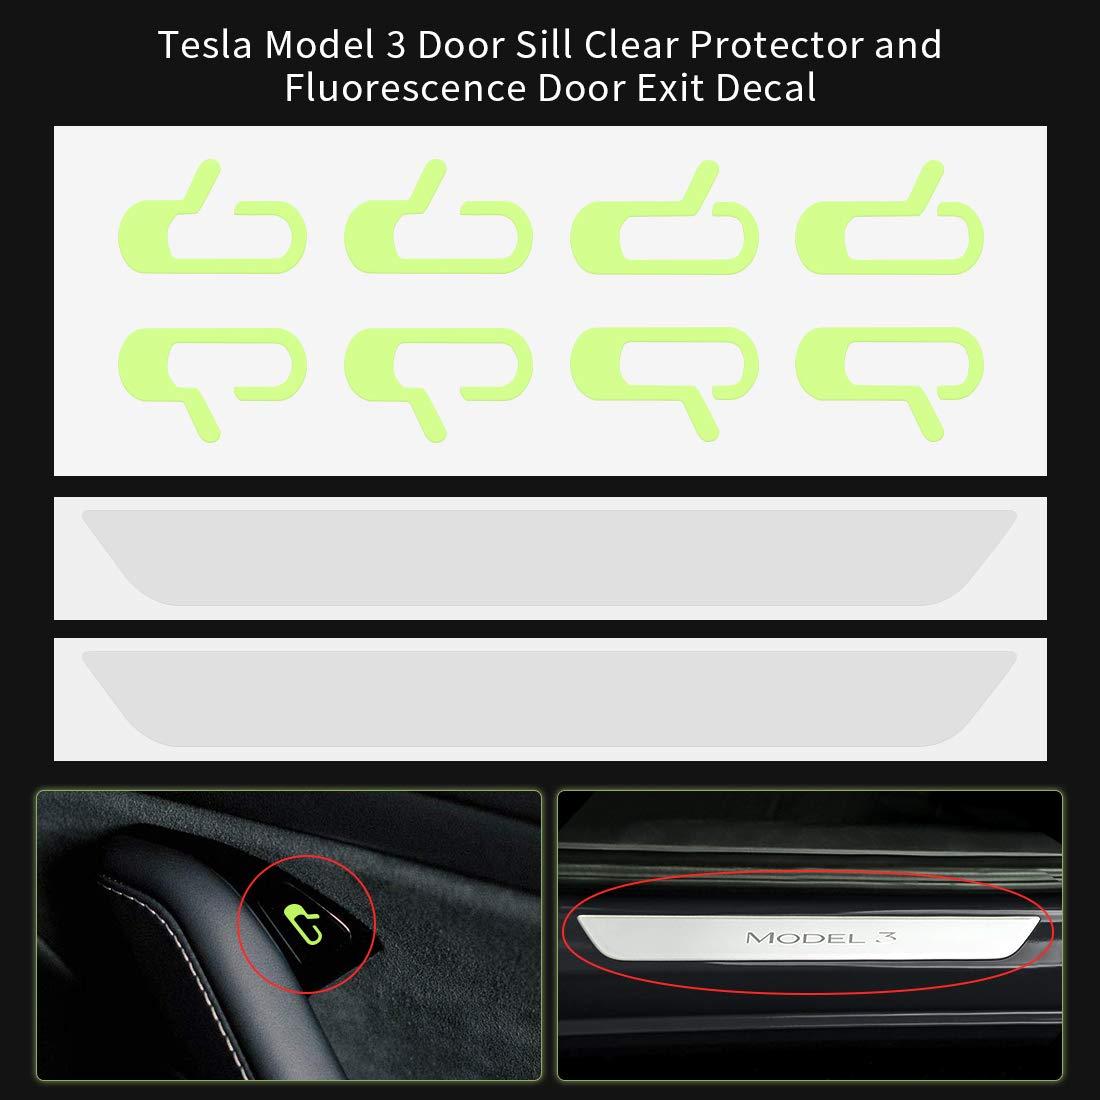 SUPAREE Tesla Model 3 Door Sill Clear Protector and Fluorescence Green Door Exit Decal Set Car Sticker for Tesla Model 3